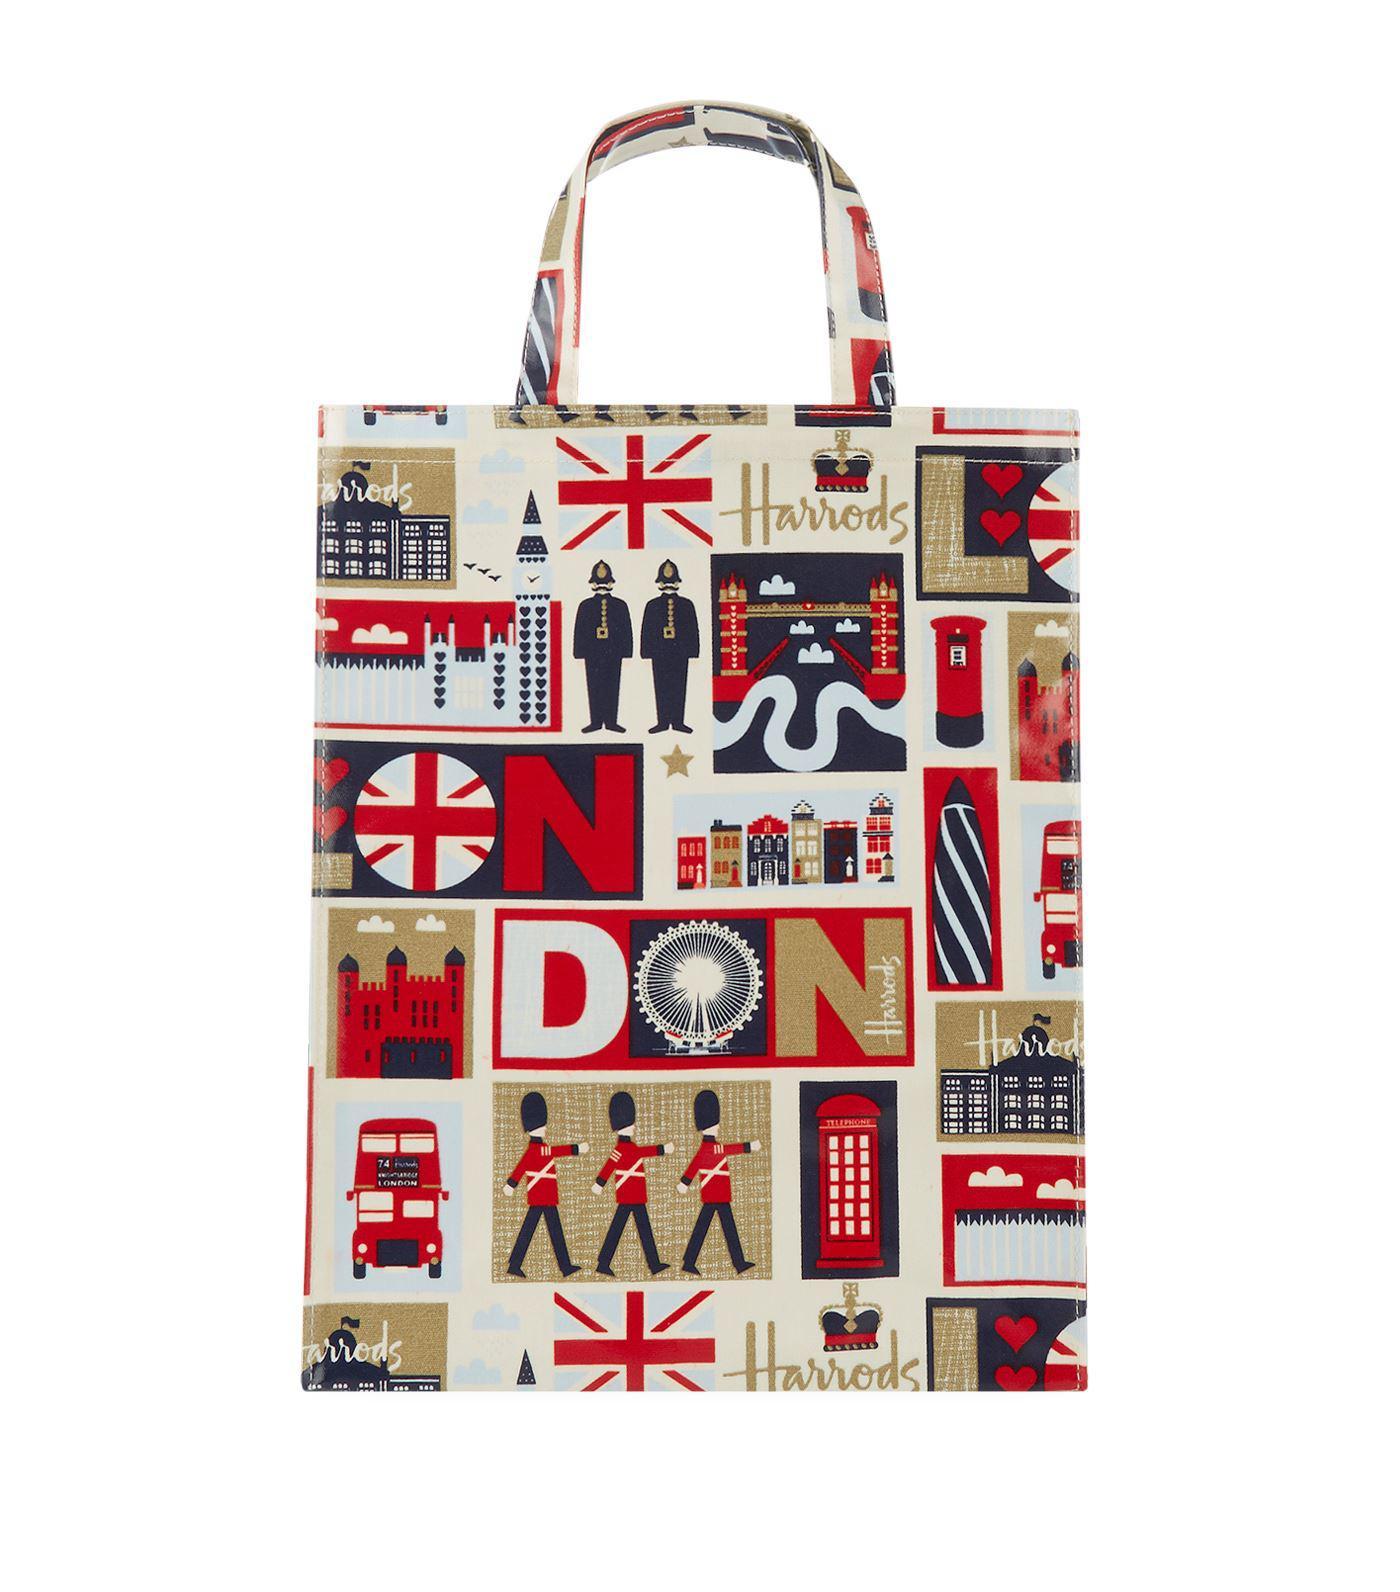 16dc890c9c827a Harrods Medium Iconic London Shopper Bag in Red - Lyst